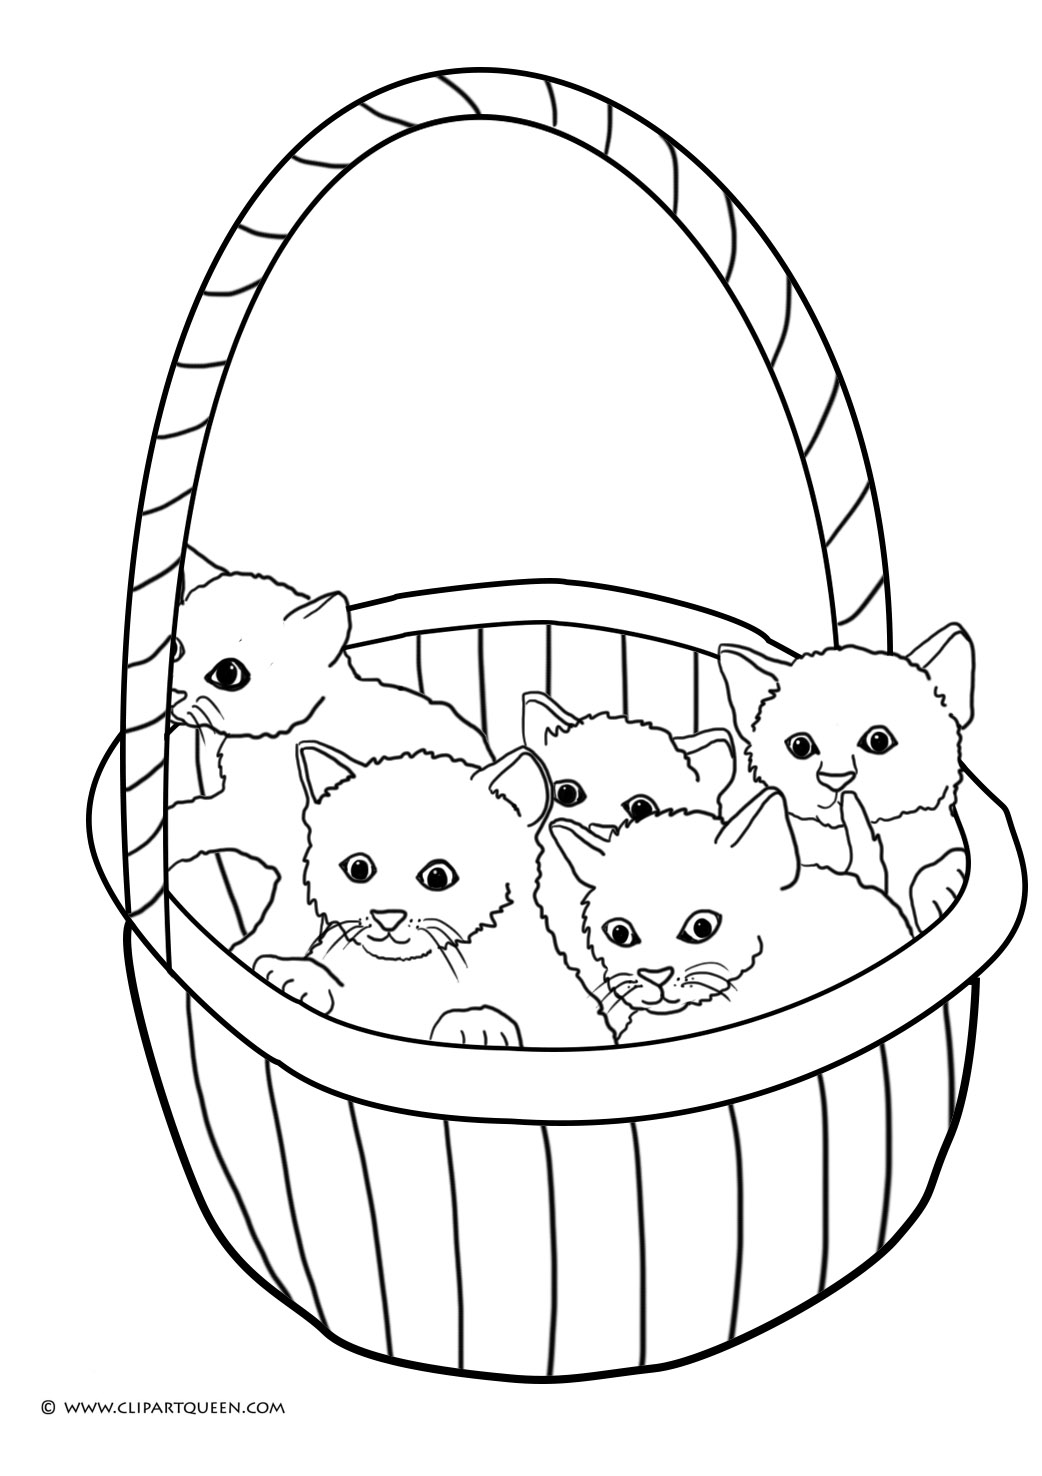 Cute Kitten Drawing At Getdrawings